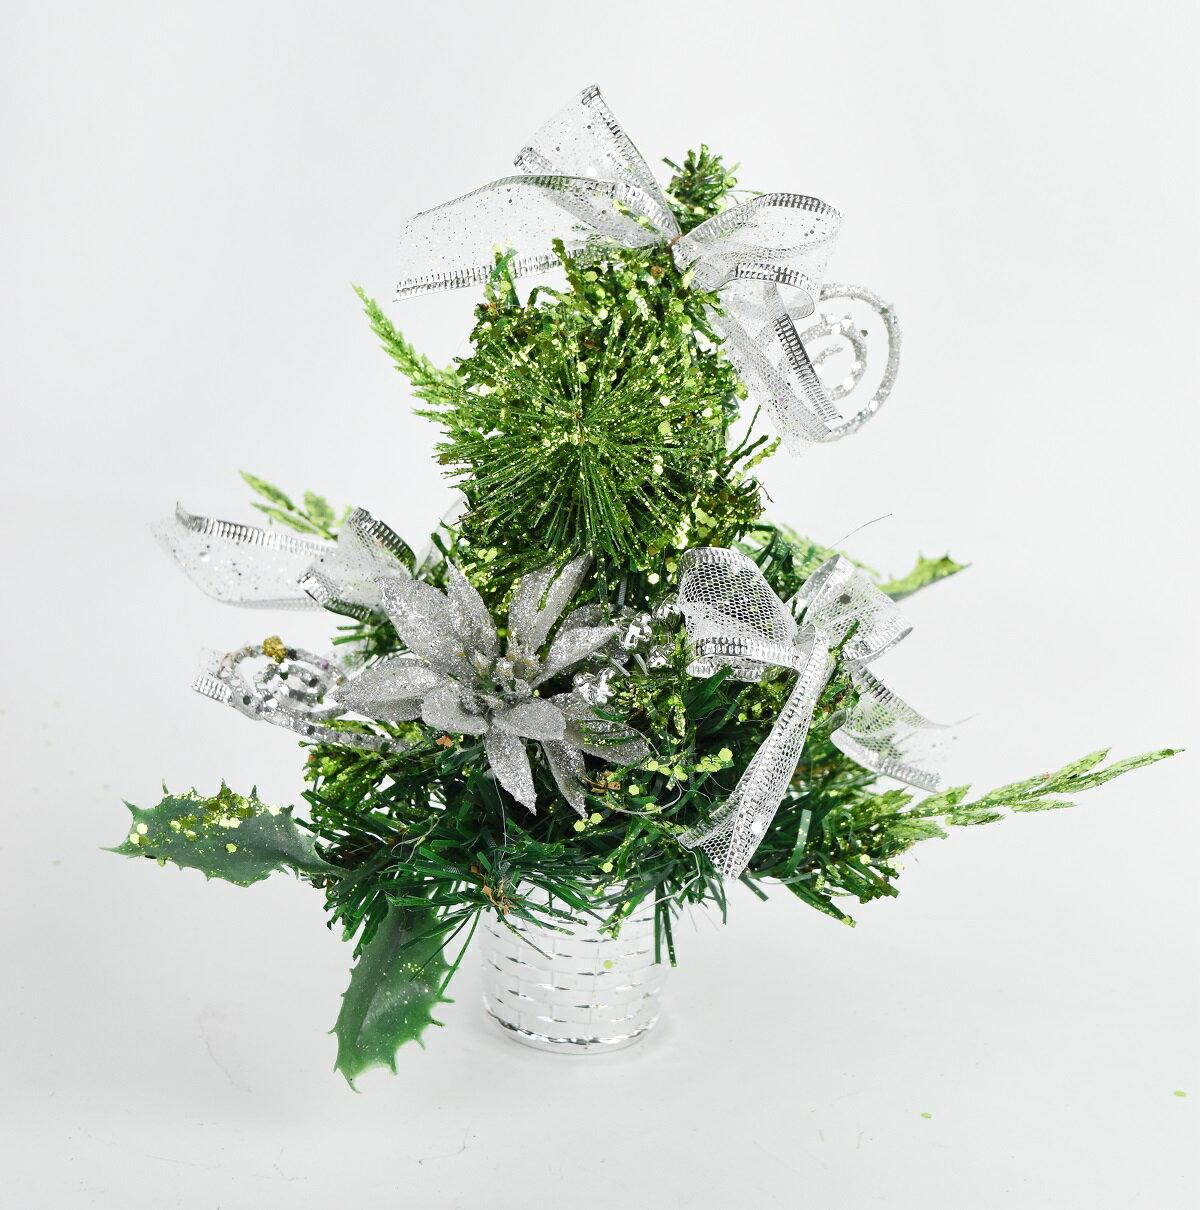 X射線【X454028】20cm裝飾聖誕樹(銀),聖誕樹/聖誕佈置/聖誕燈/會場佈置/材料包/成品樹/小樹